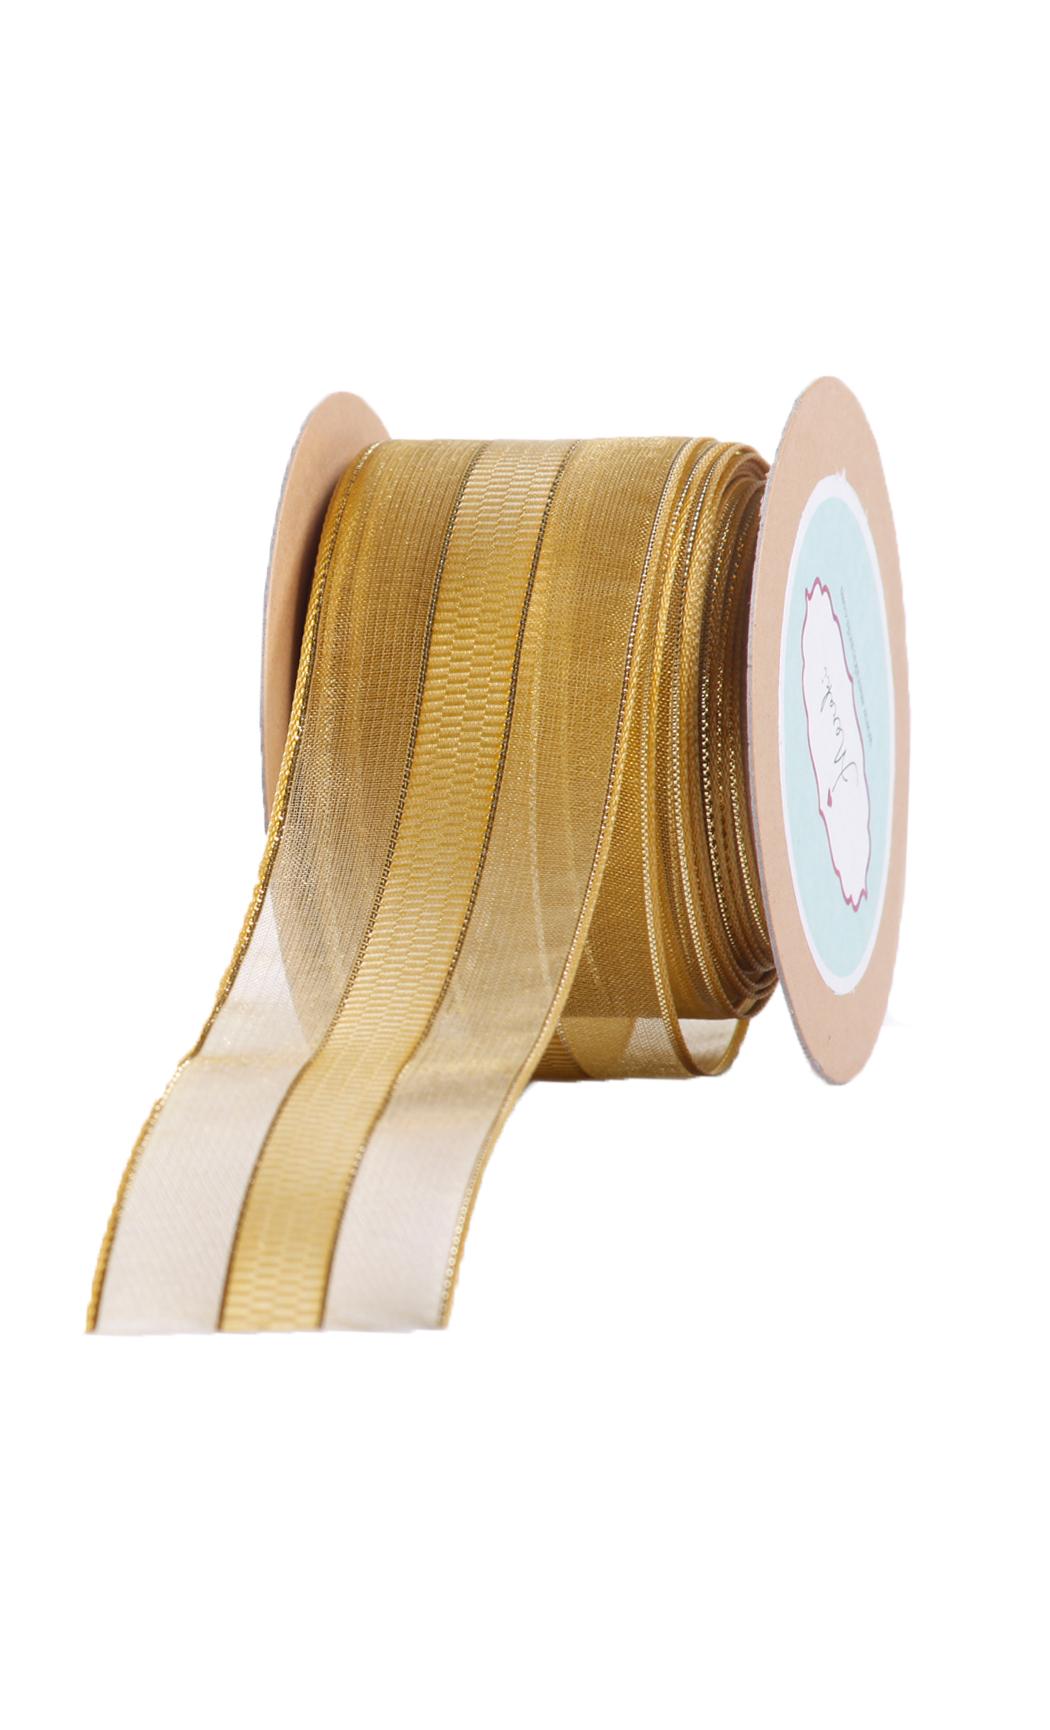 Gold Sheer-Checkered Ribbon - Buy Online